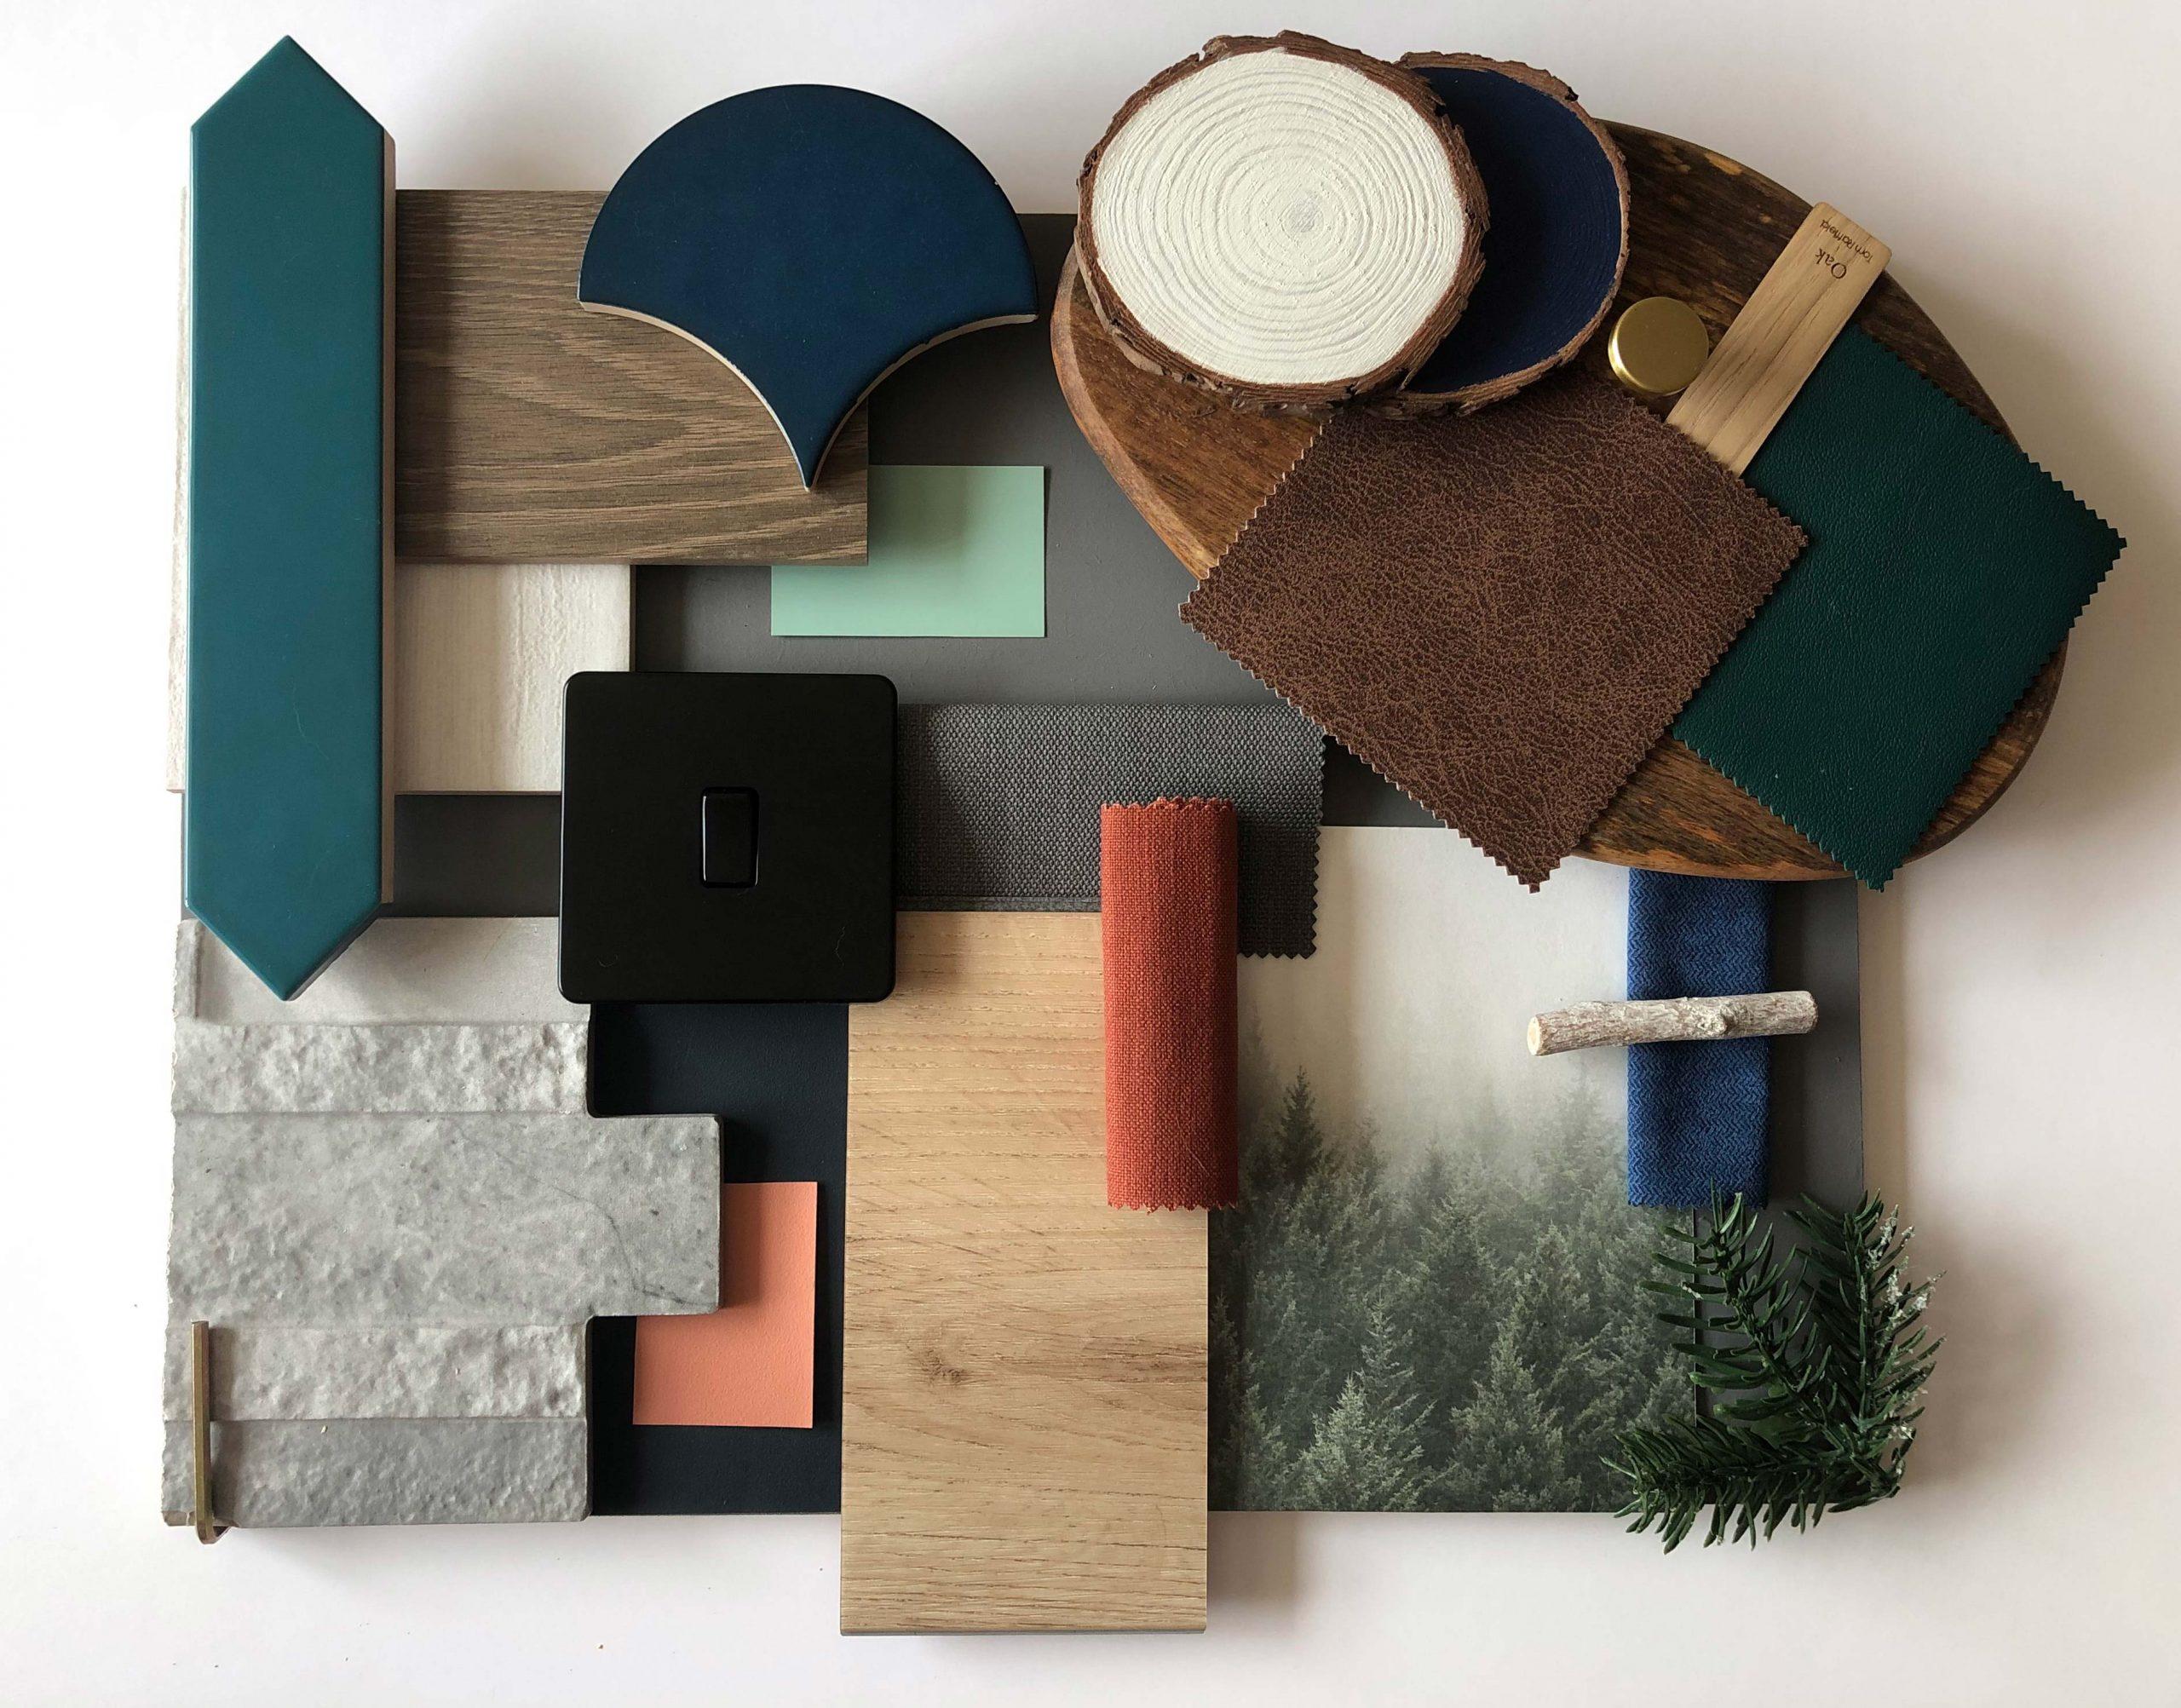 Treehouse Retreat- Final Major Project-Material Board